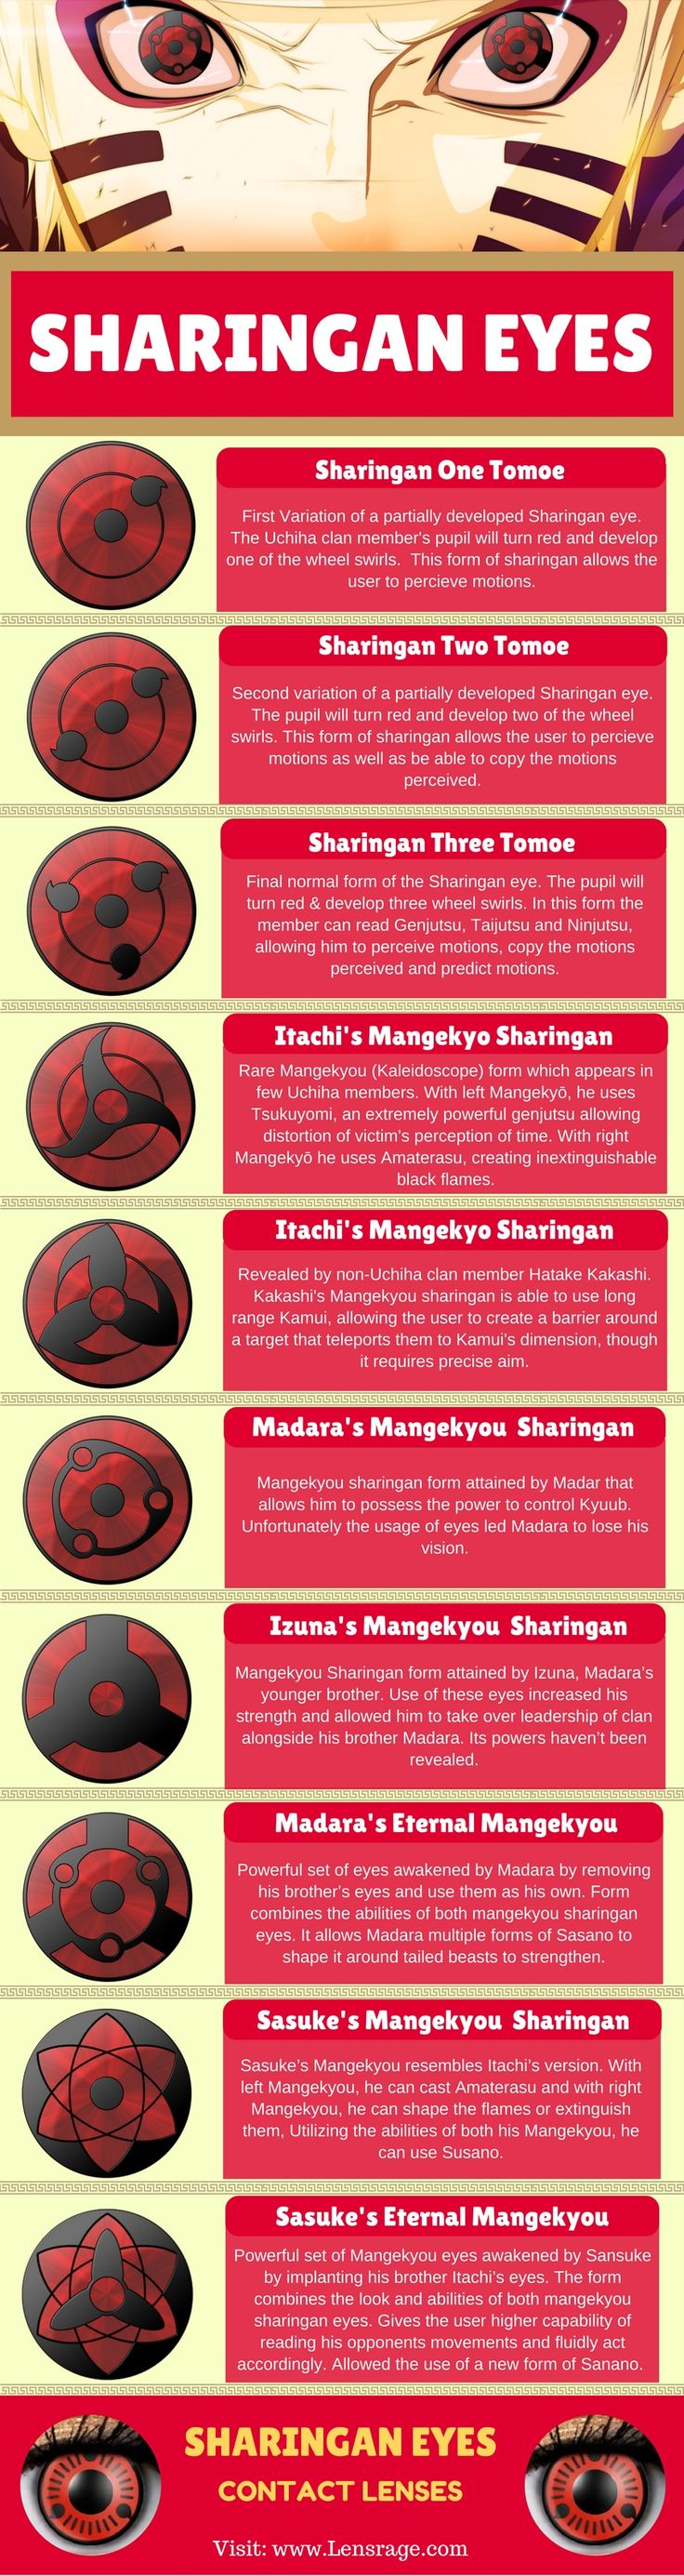 SHARINGAN EYES contact lenses infographic